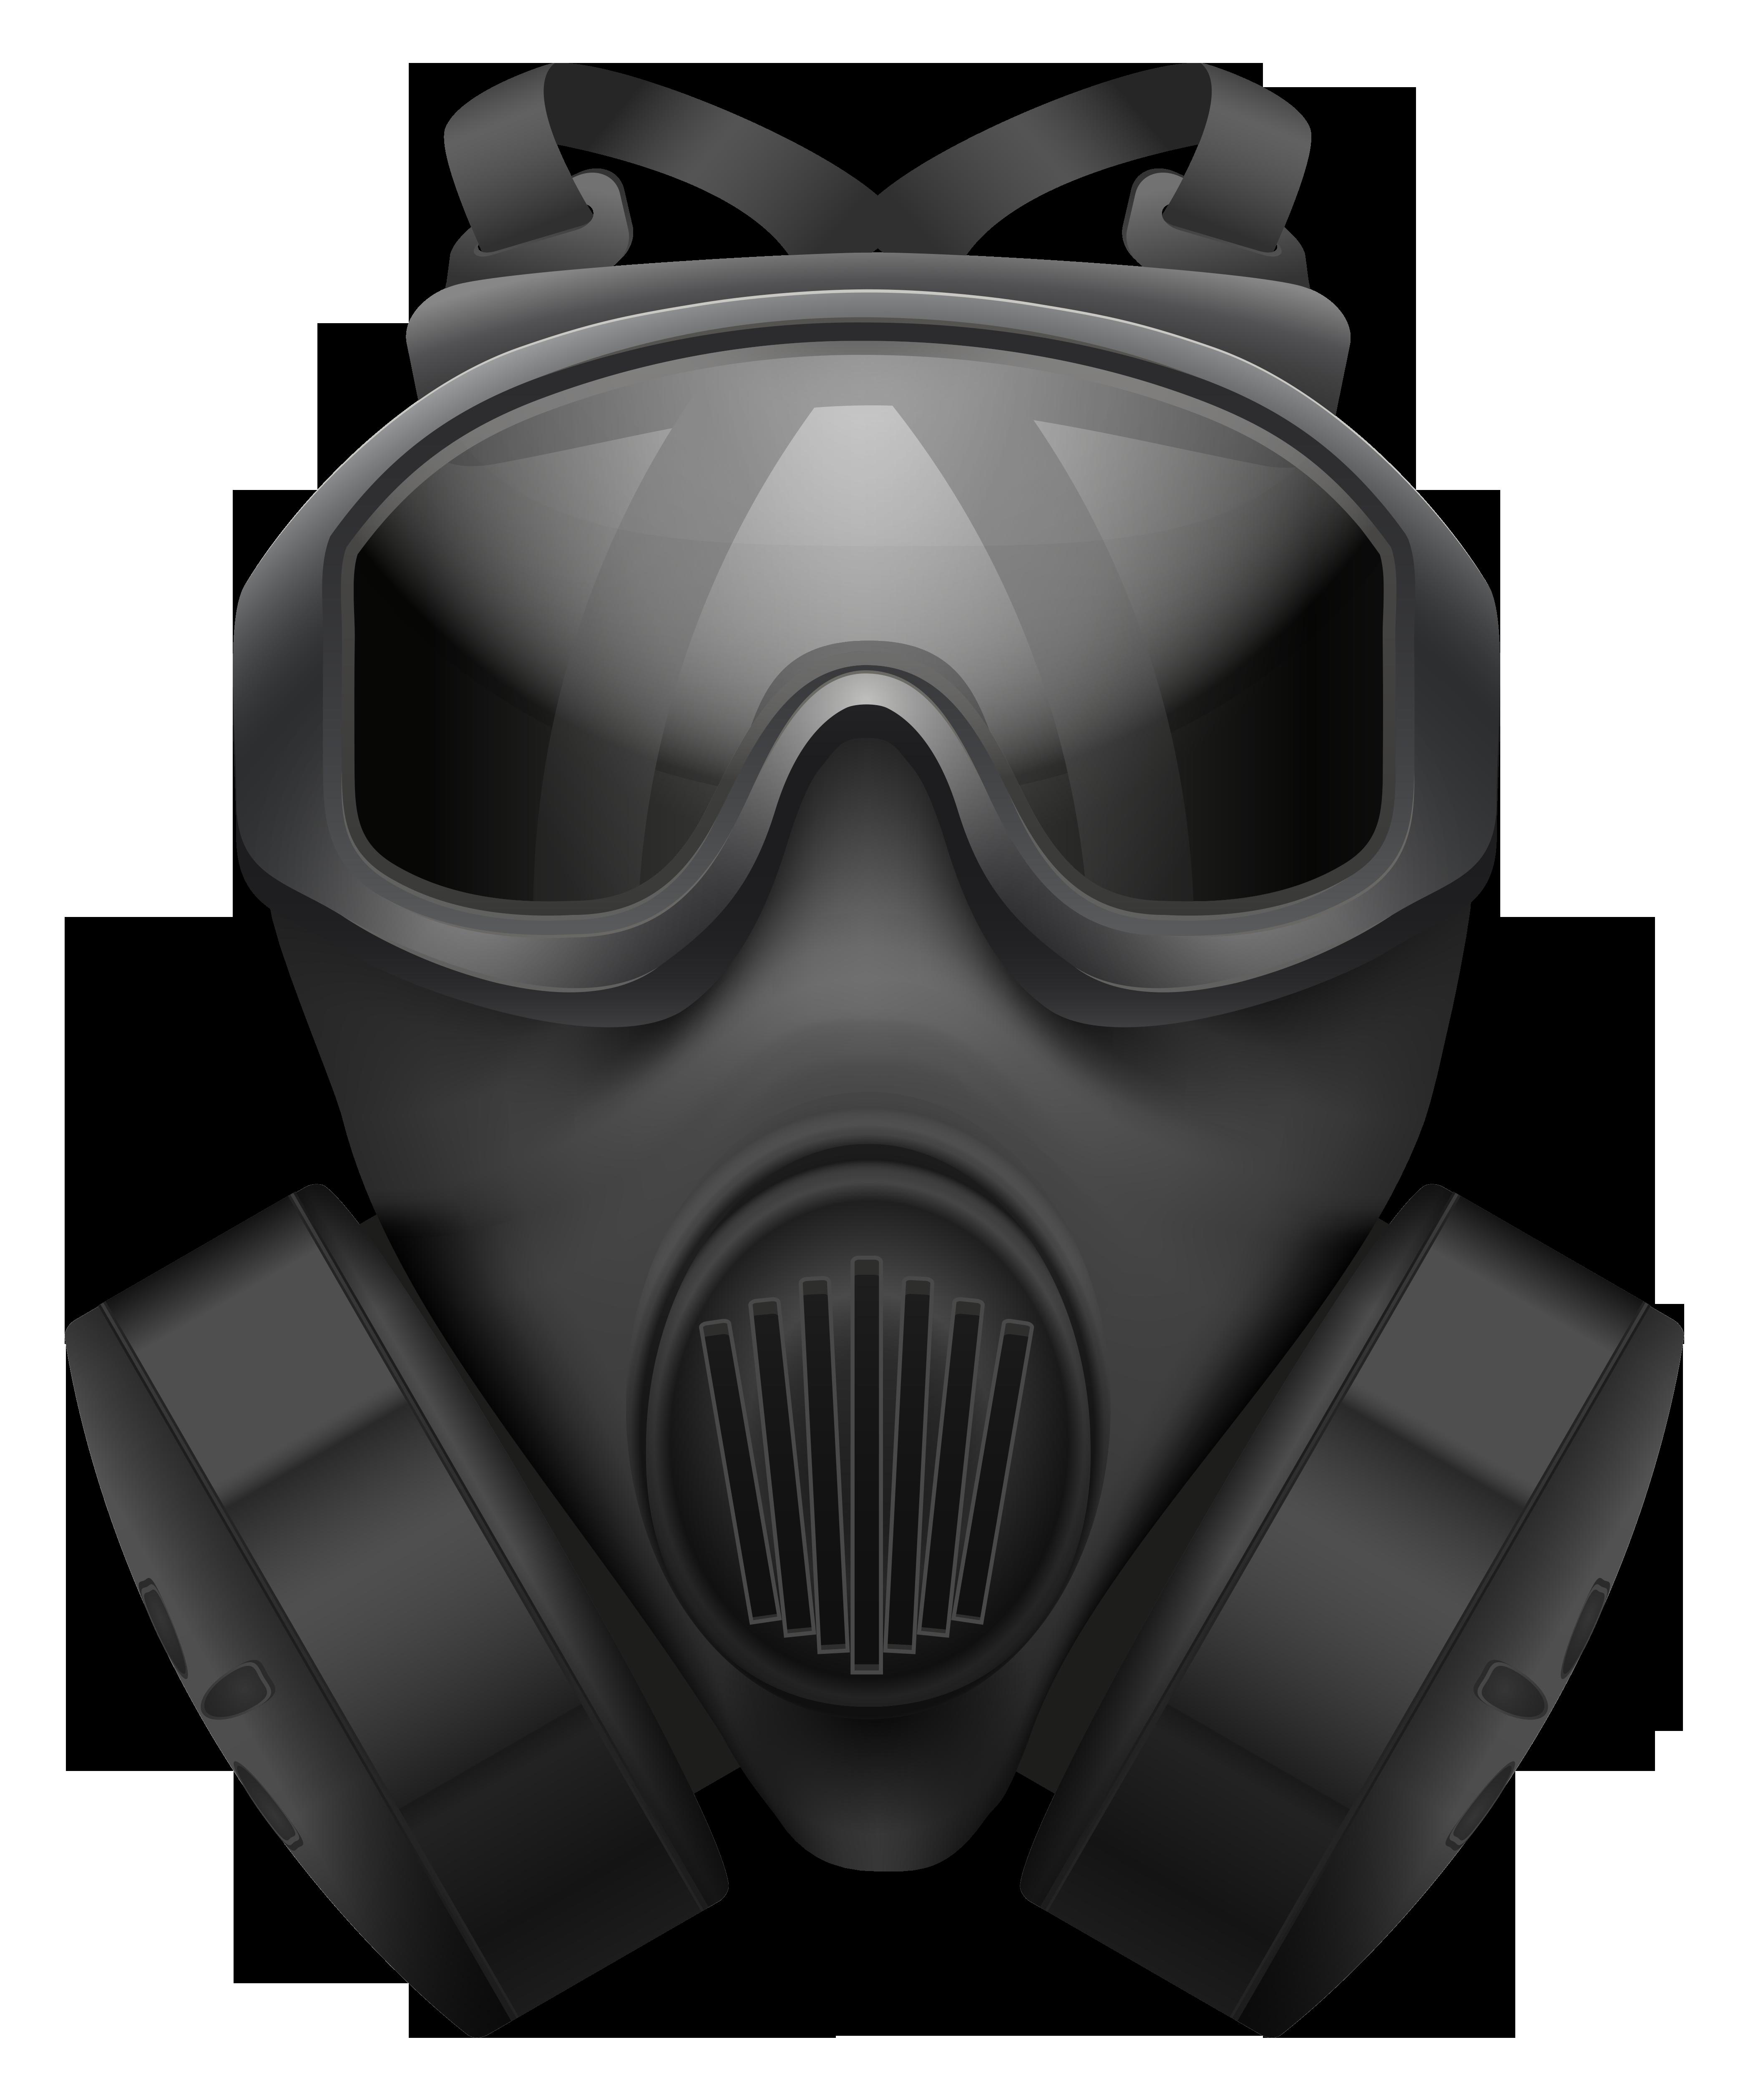 download gas mask png hq png image freepngimg